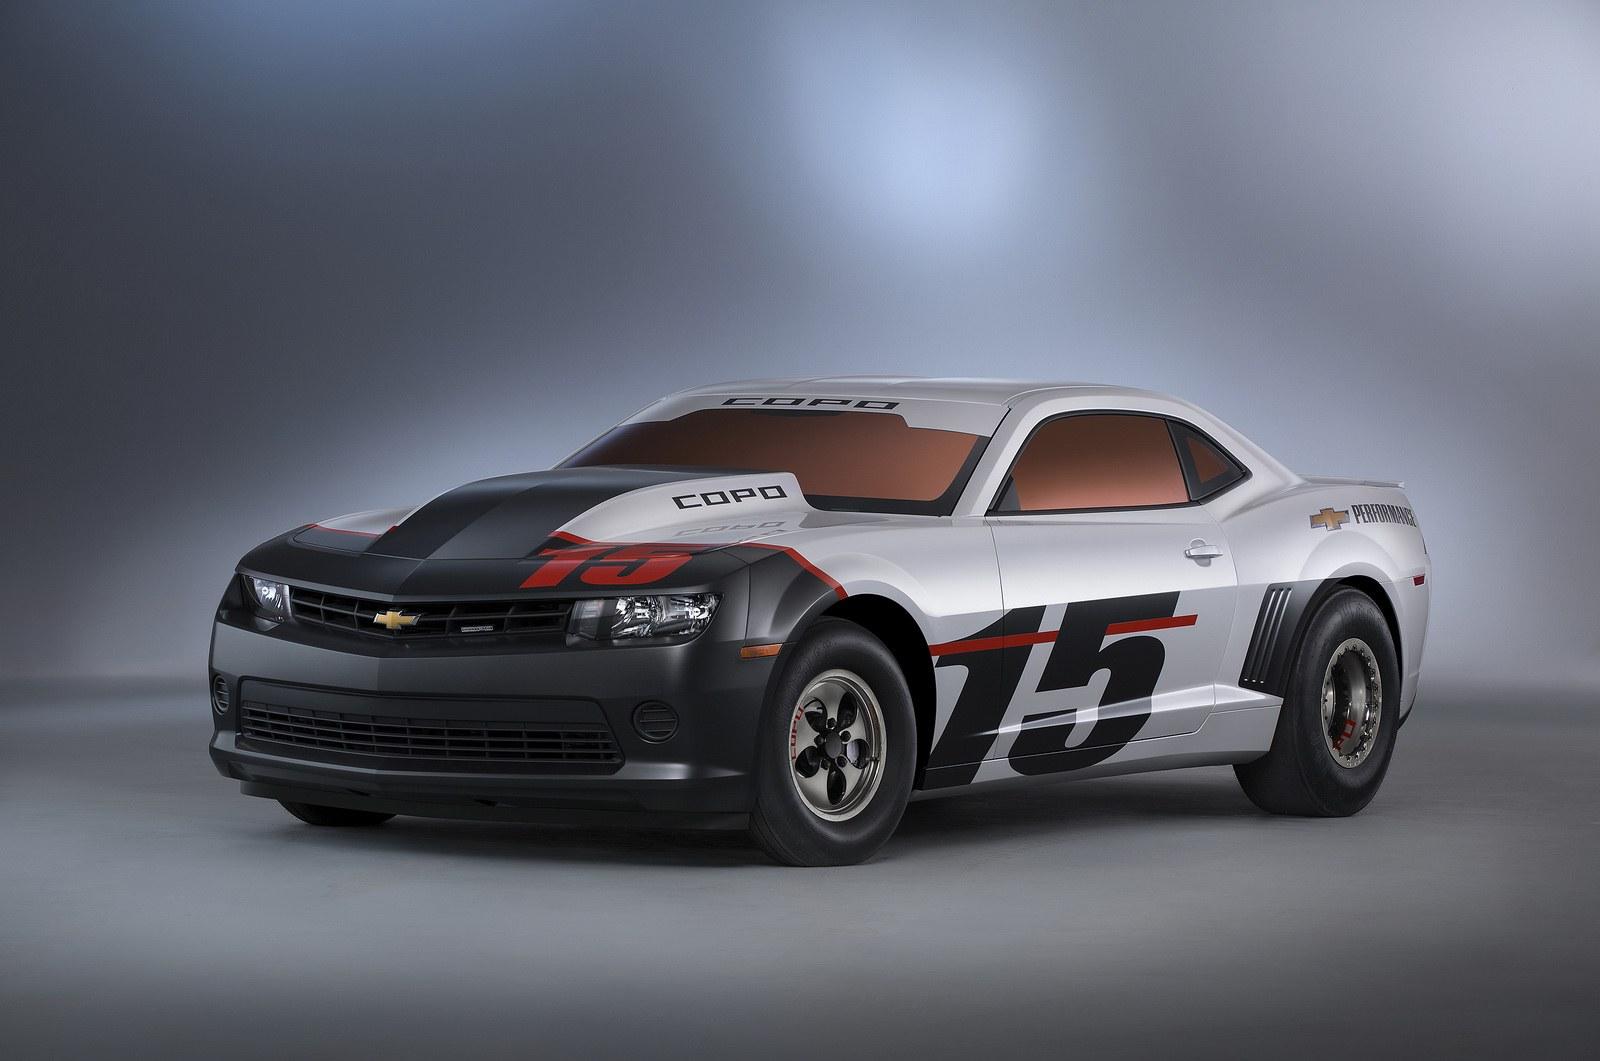 2015-Chevrolet-COPO-Camaro-1